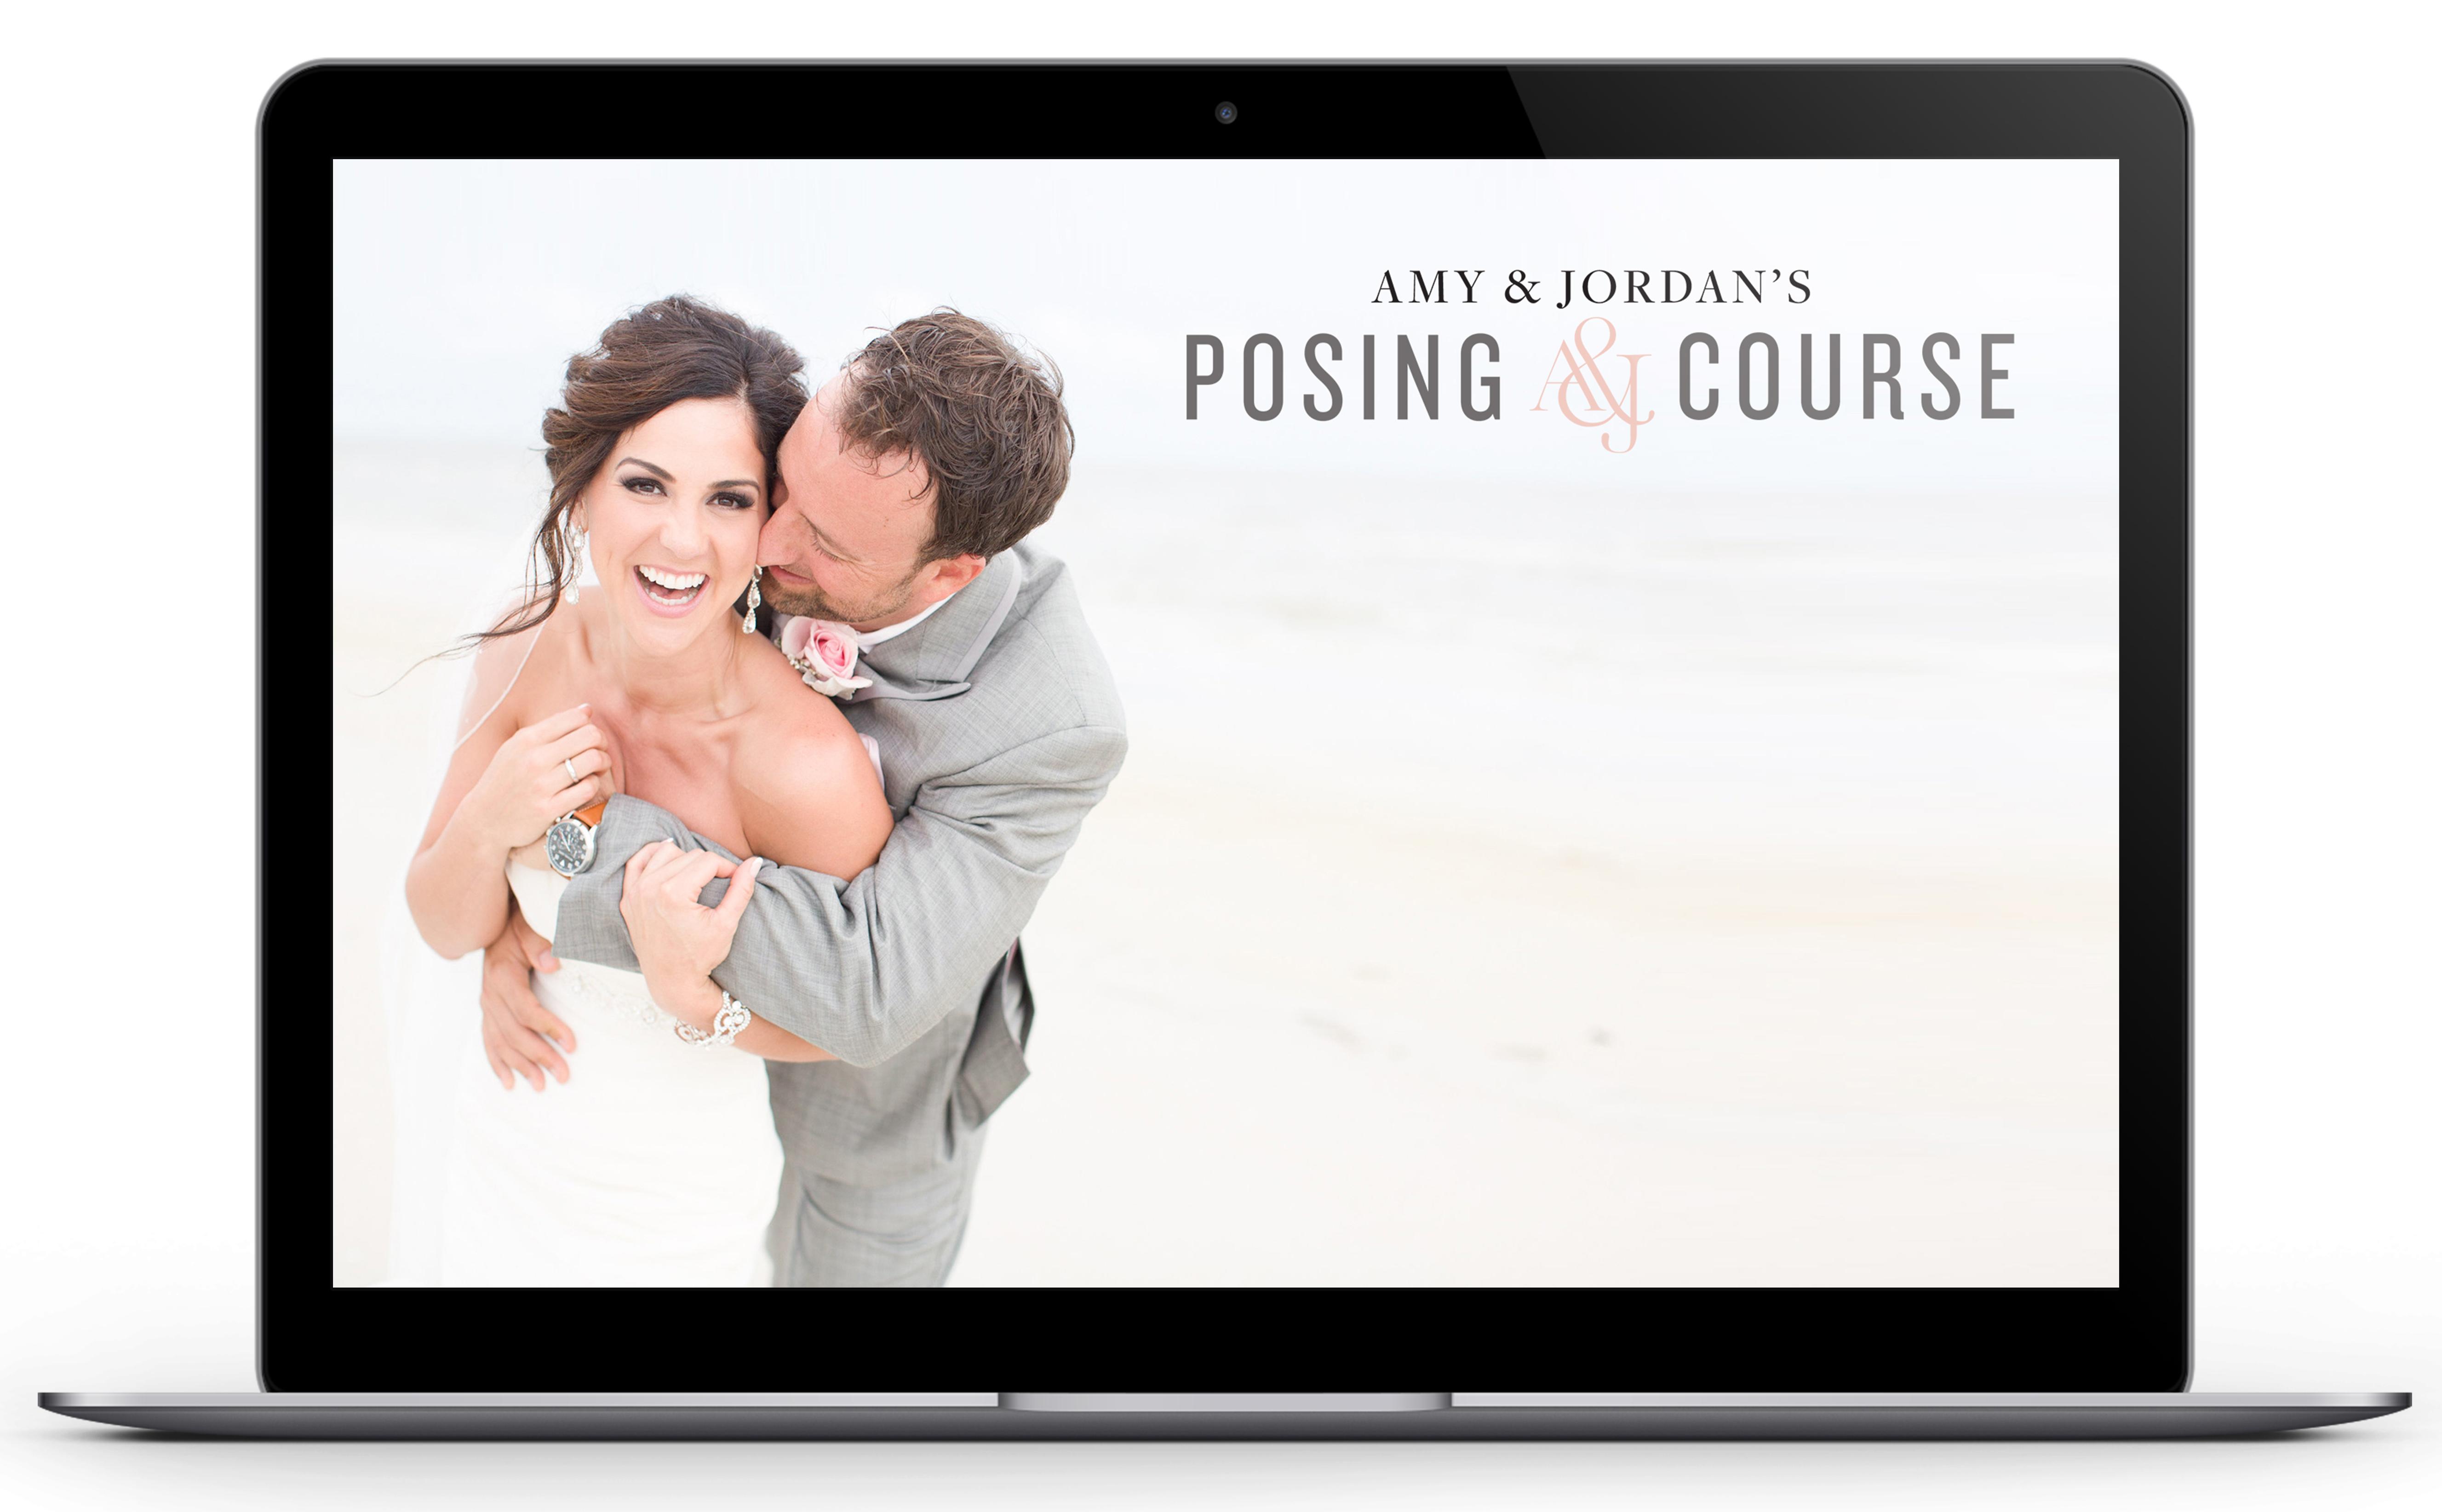 Amy & Jordan's Posing Course